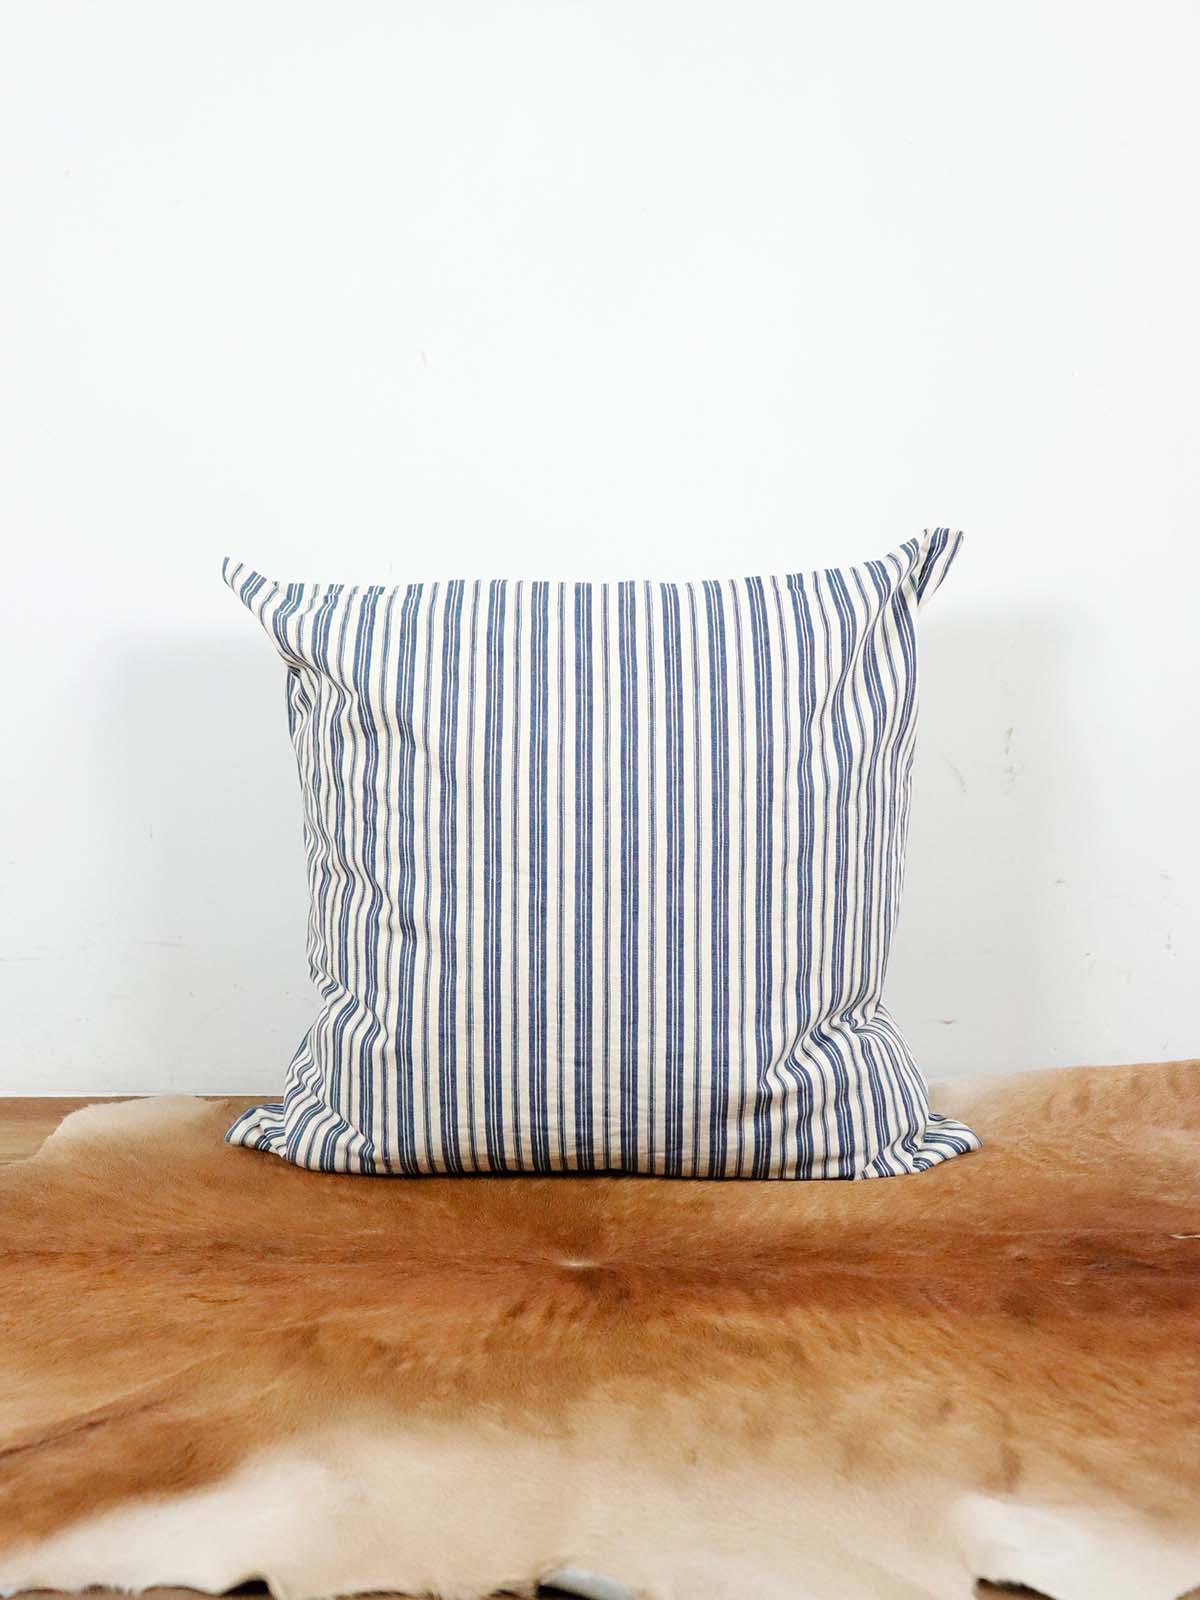 BROWN.remake,cushion,vintage,ticking,cotton,USA